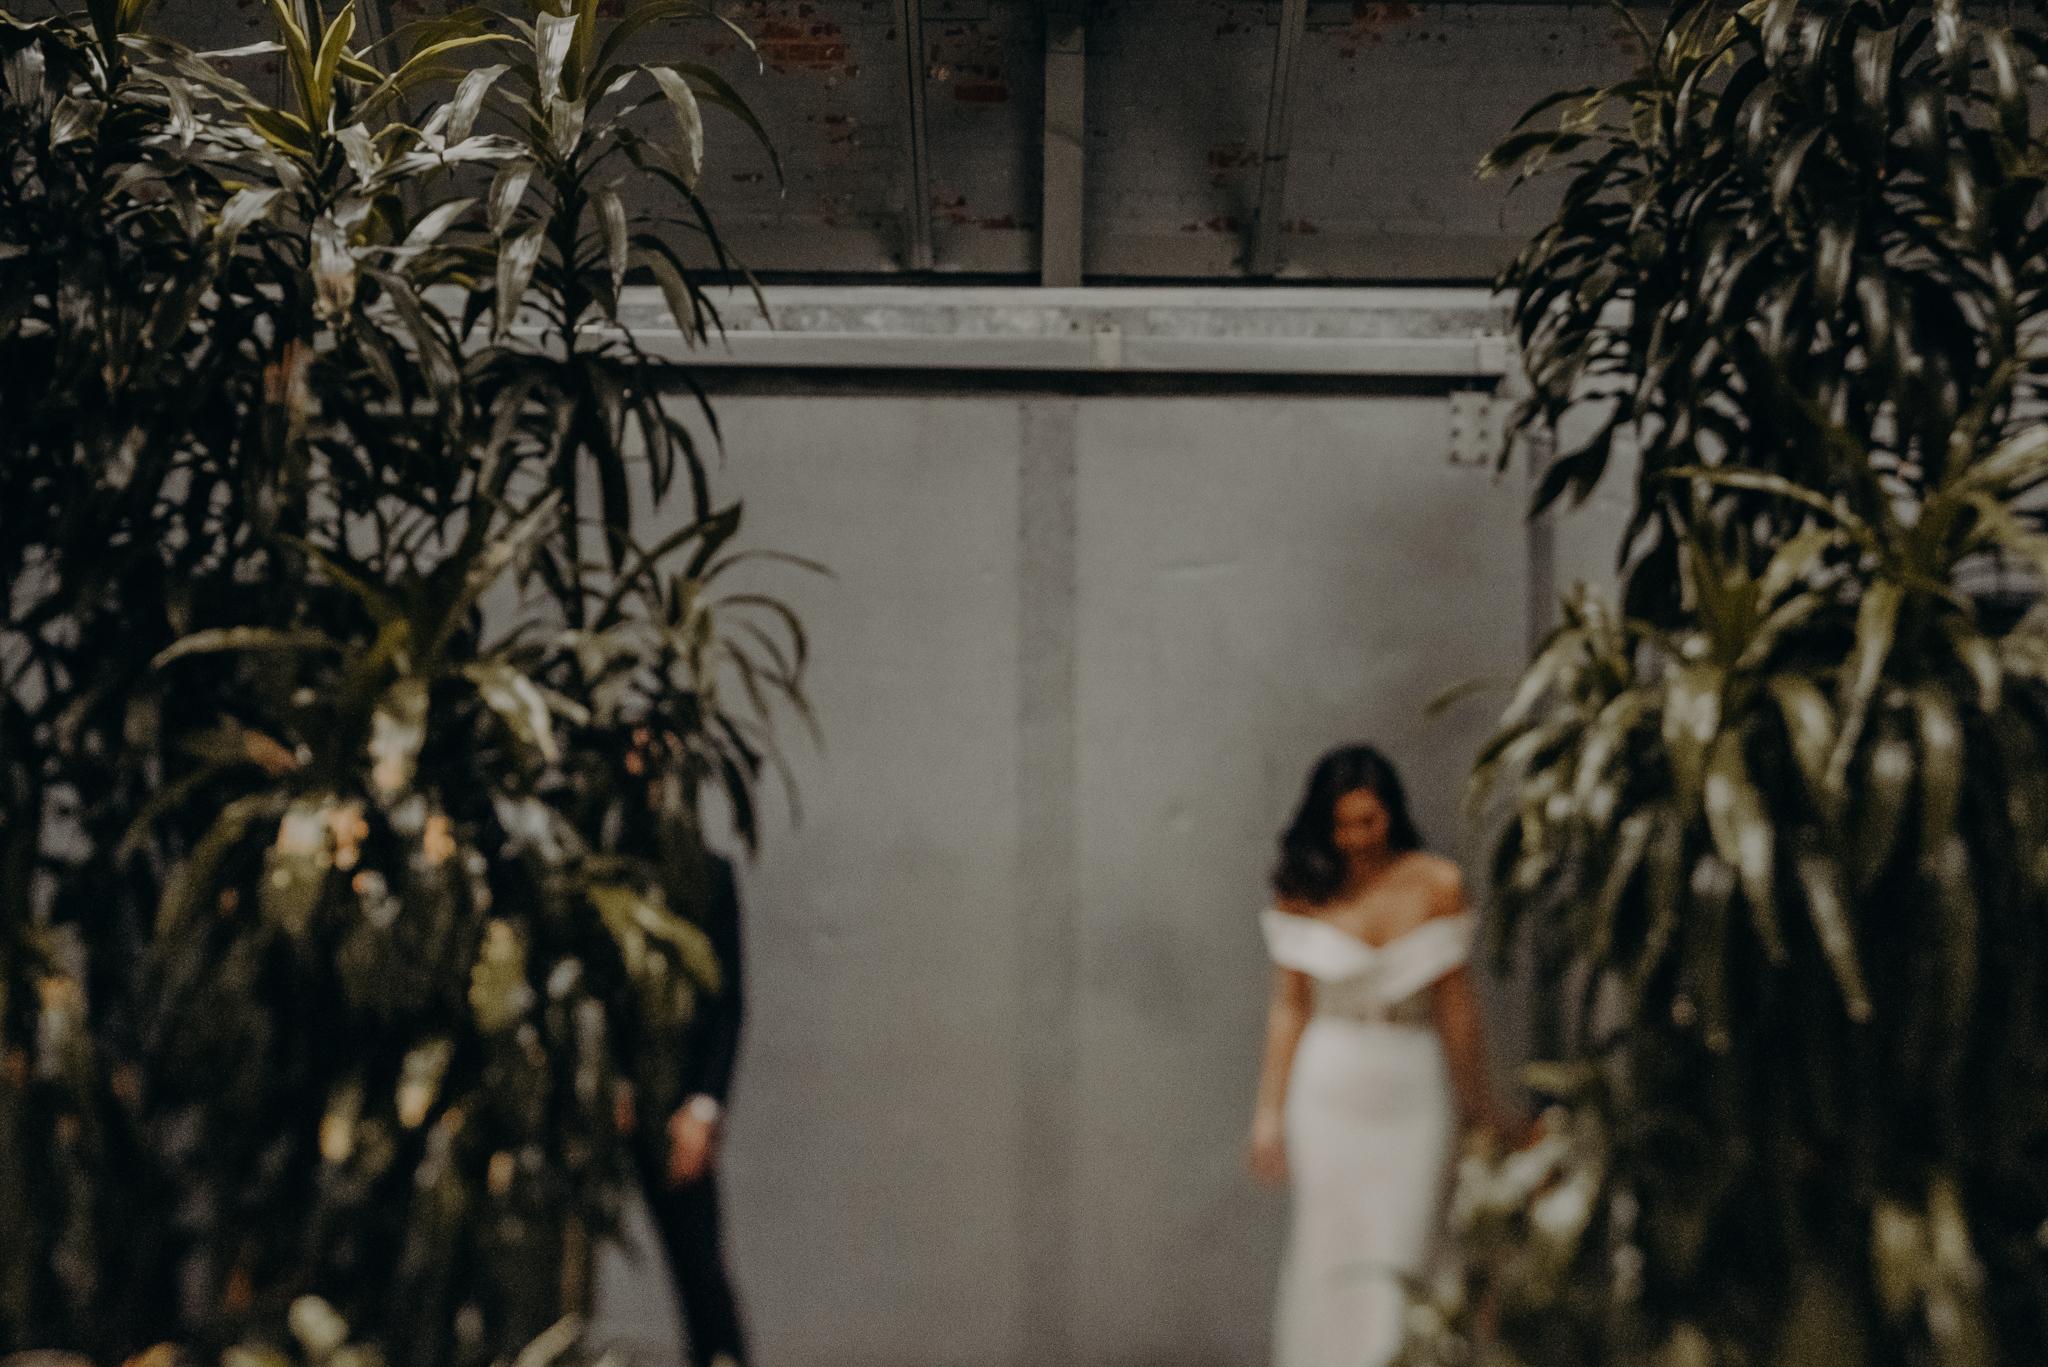 Wedding Photo LA - wedding photographer in los angeles - millwick wedding venue -isaiahandtaylor.com-032.jpg